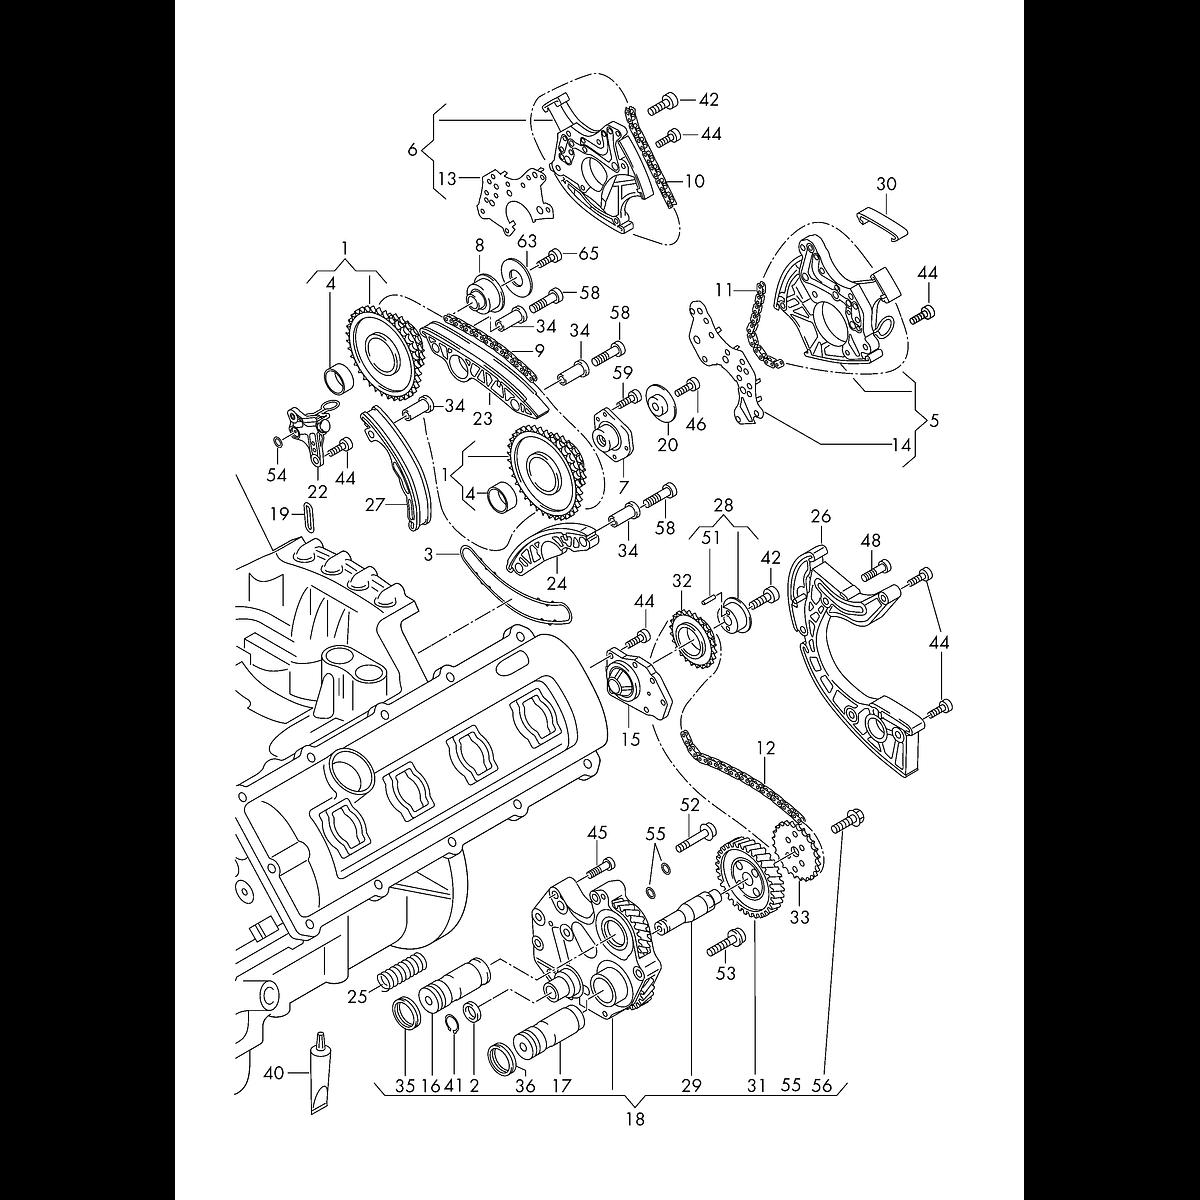 Manual De Despiece Audi Q7 (2006-2015) Español